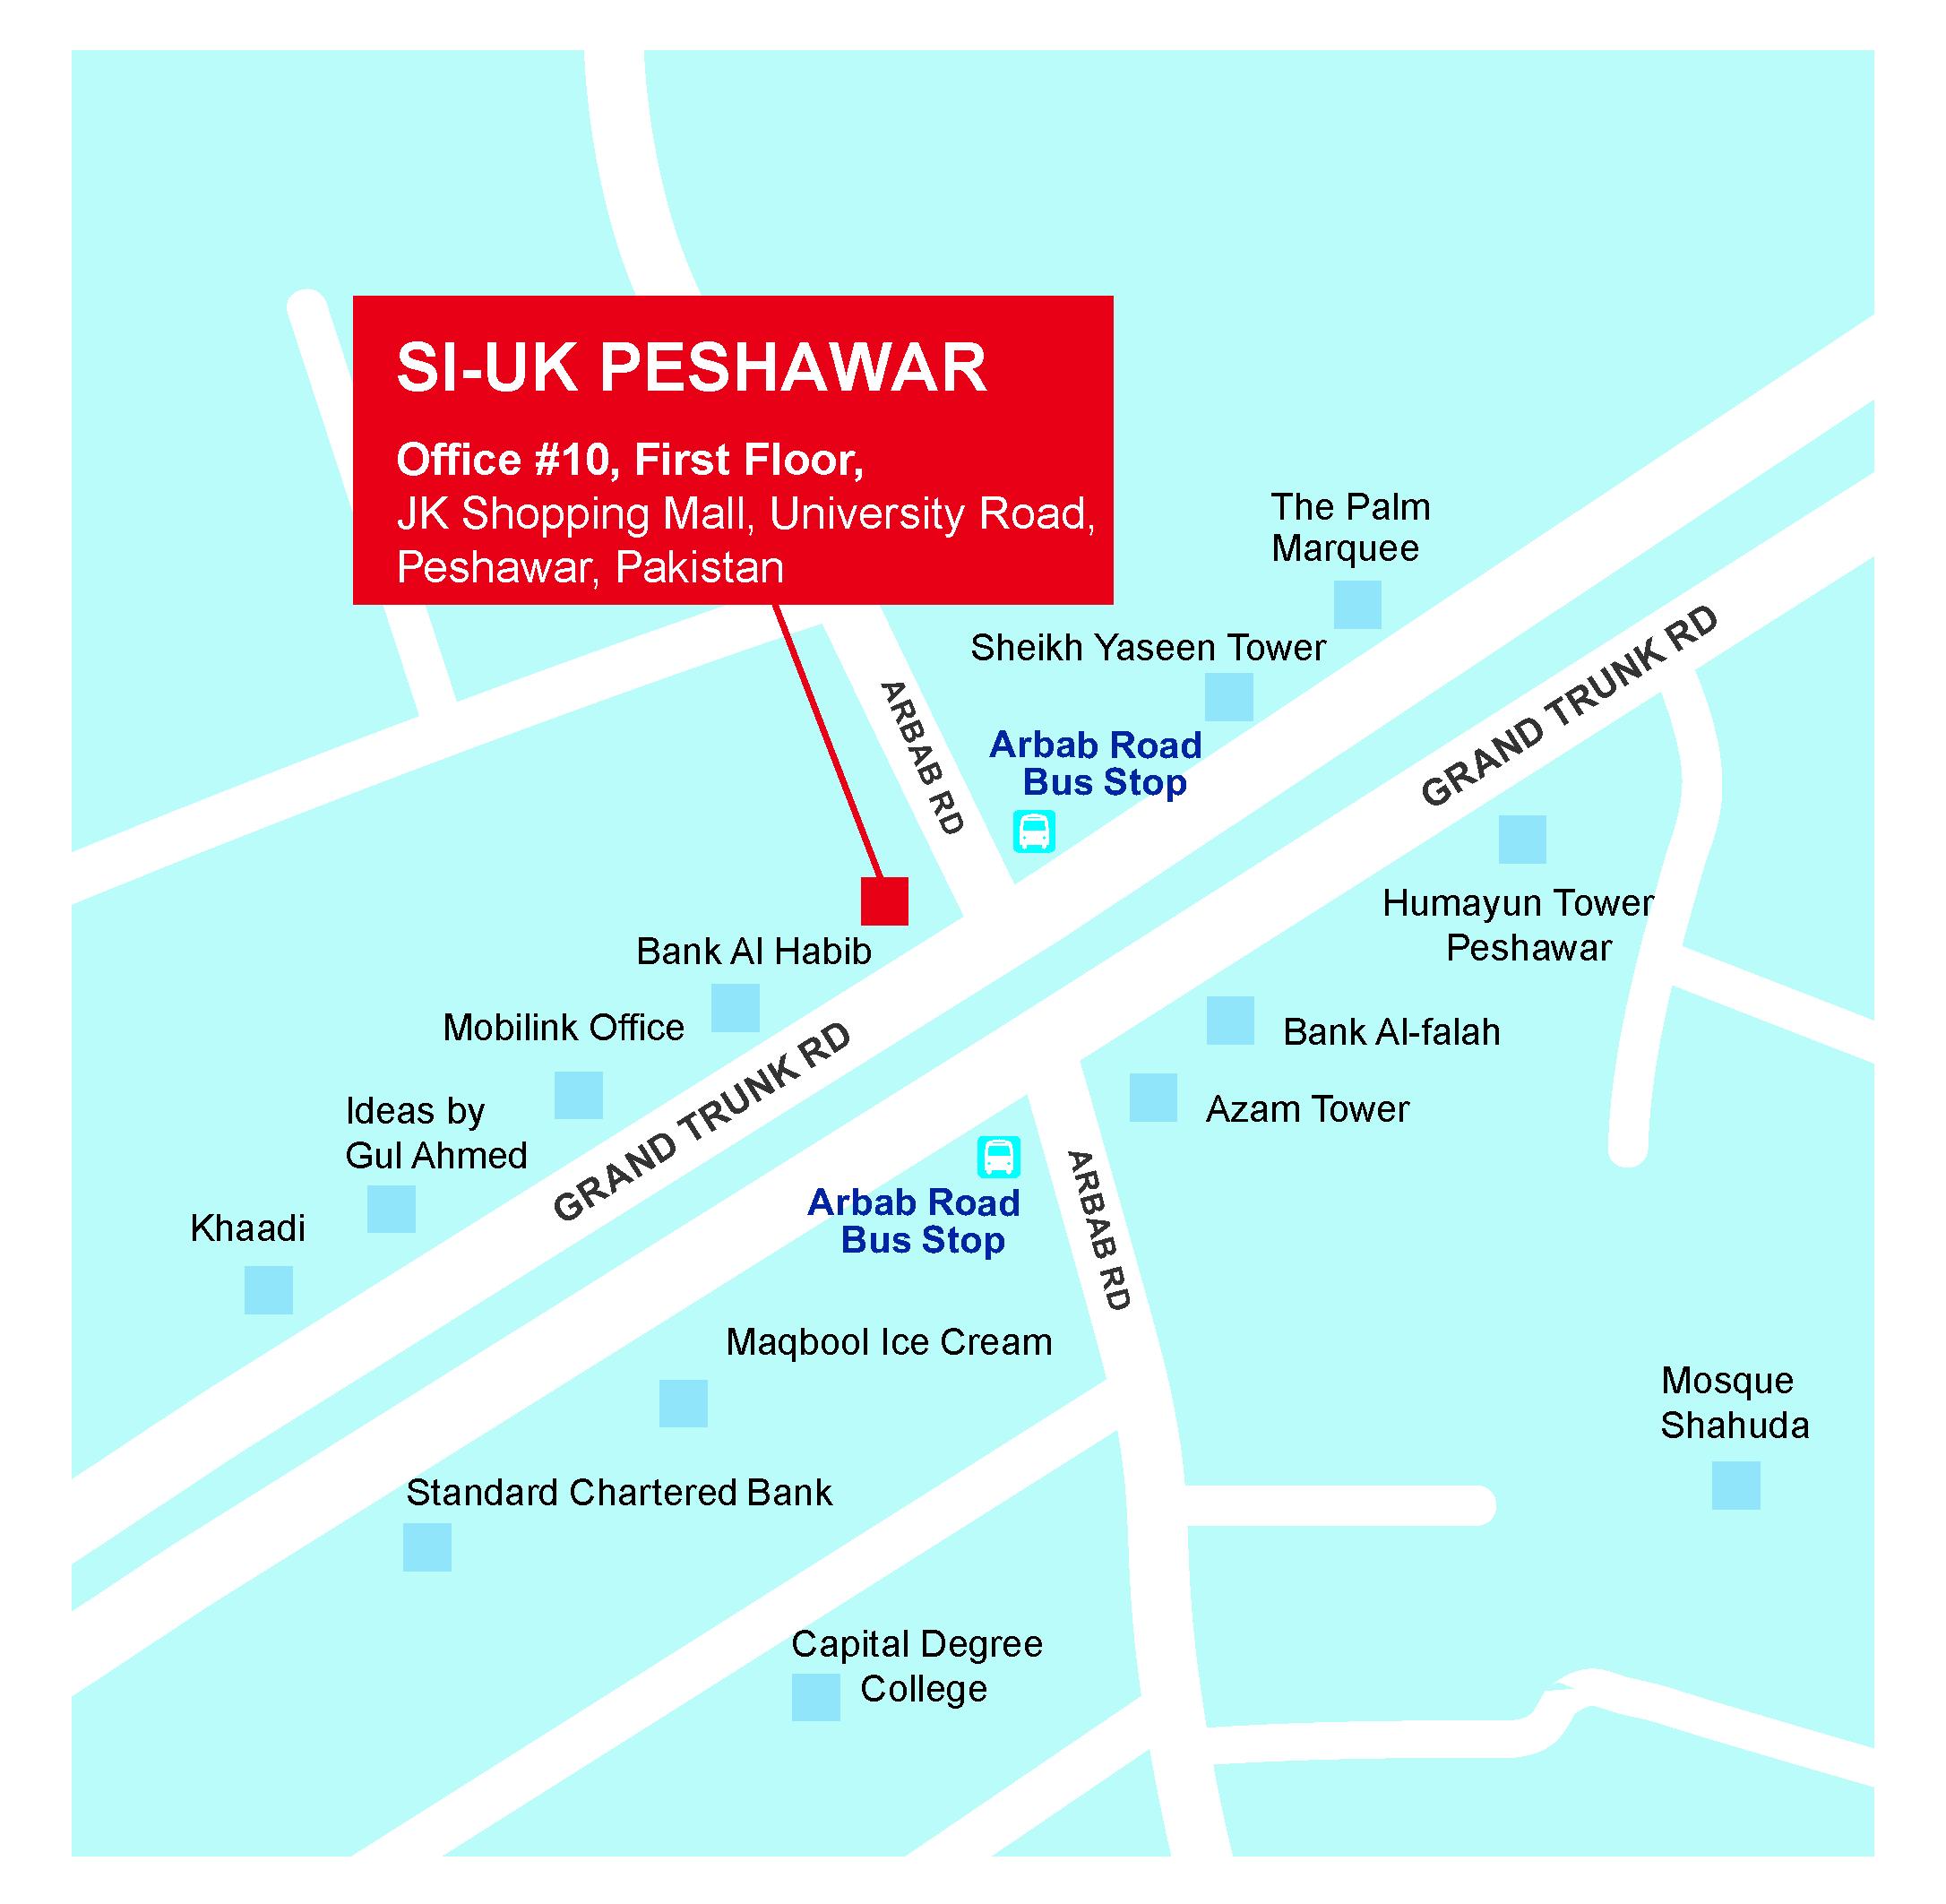 SI-UK Peshawar